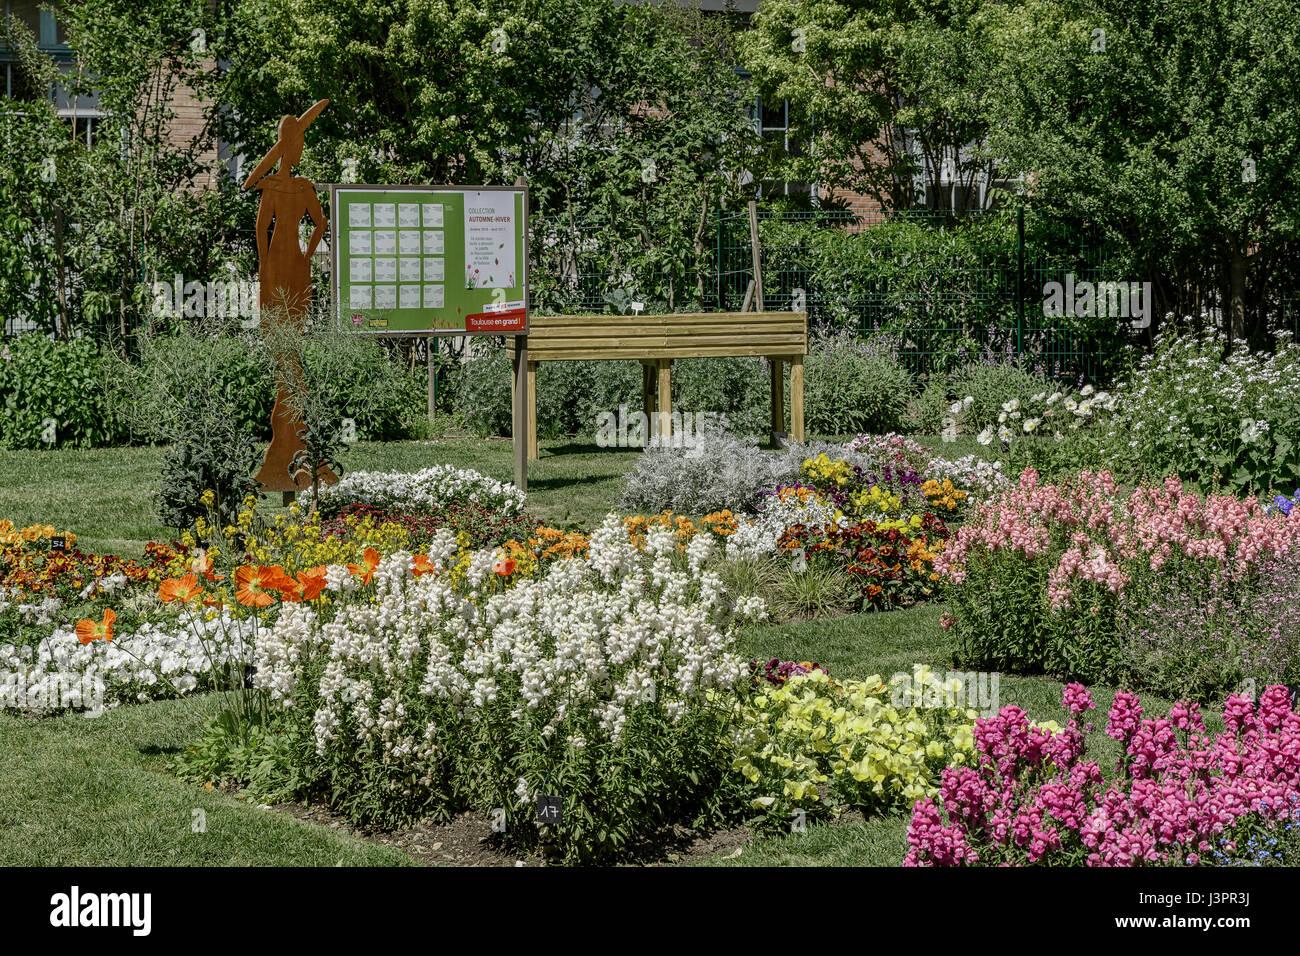 Jardin Des Plantes Toulouse Stockfotos & Jardin Des Plantes ...